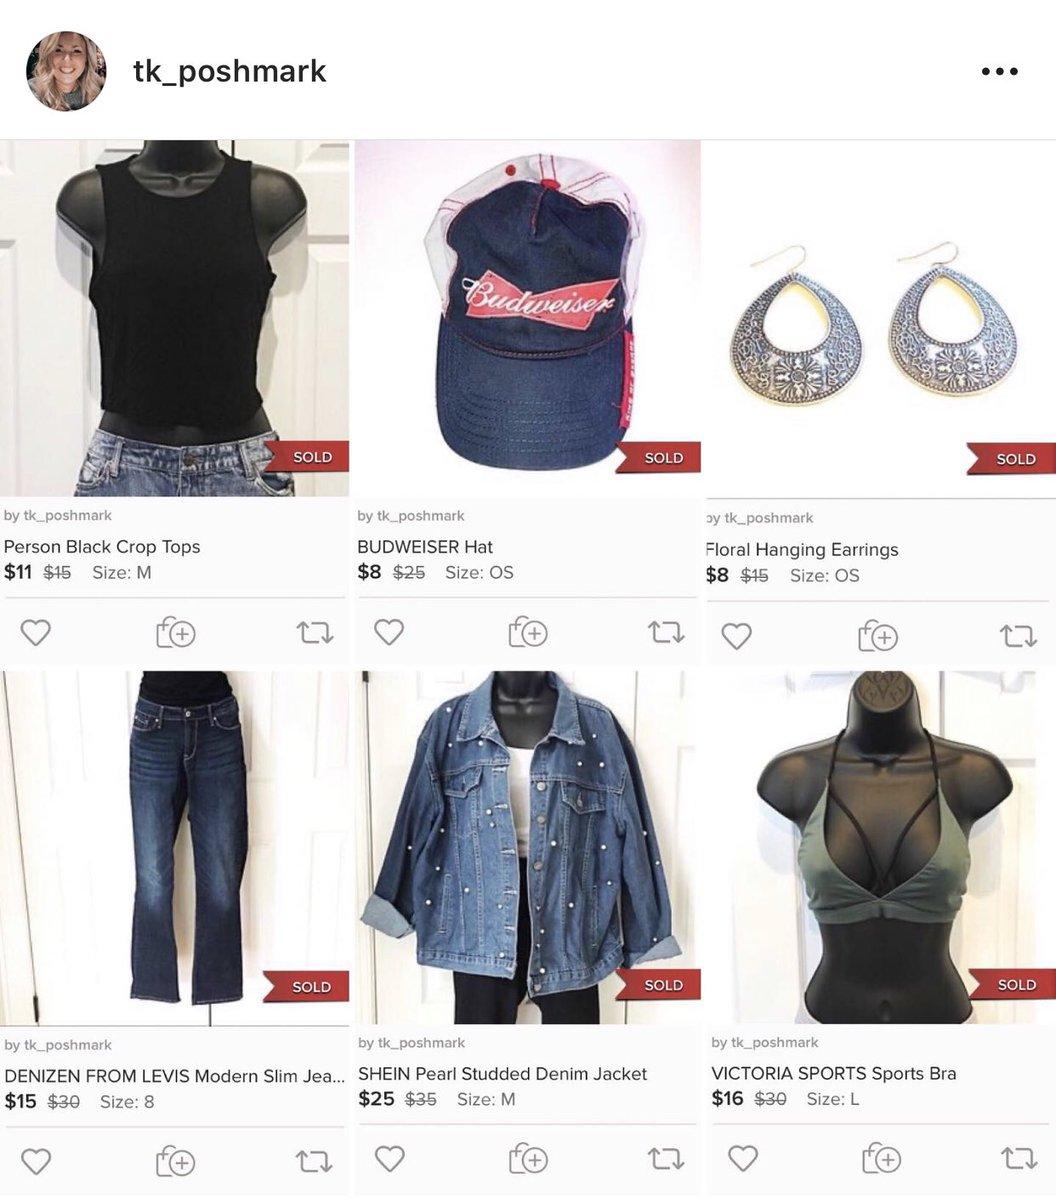 I made some sales today!!!!   #poshmark #poshmarkseller #reseller #croptop #hat #earrings #jeans #denimjacket #sportsbra #sale #offers #offertolikers #poshbundlepic.twitter.com/5ZHsH3YYKK